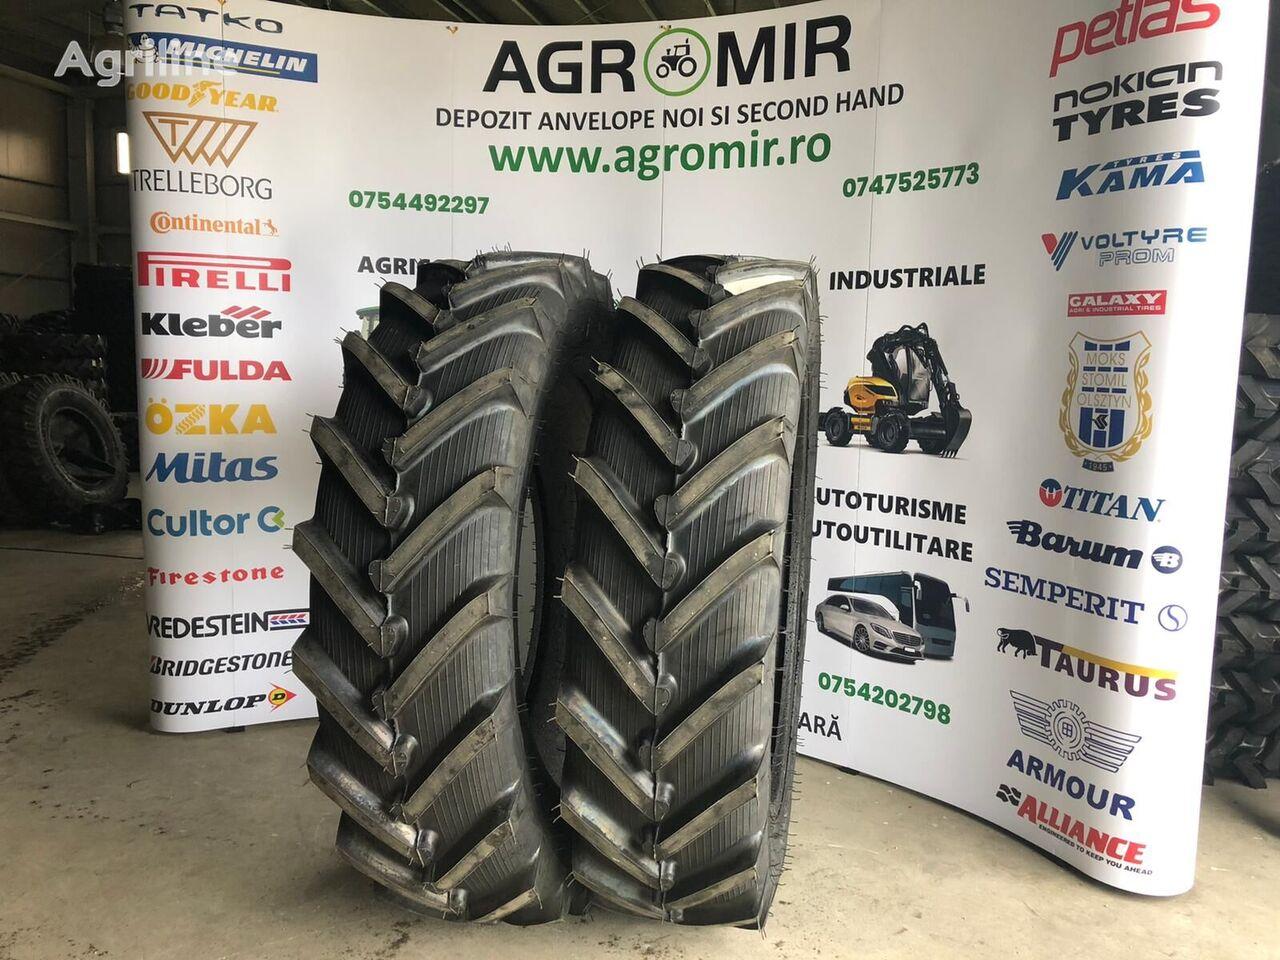 новая шина для трактора Voltyre-Titan 15.5-38 cauciucuri tractor belarus spate U650